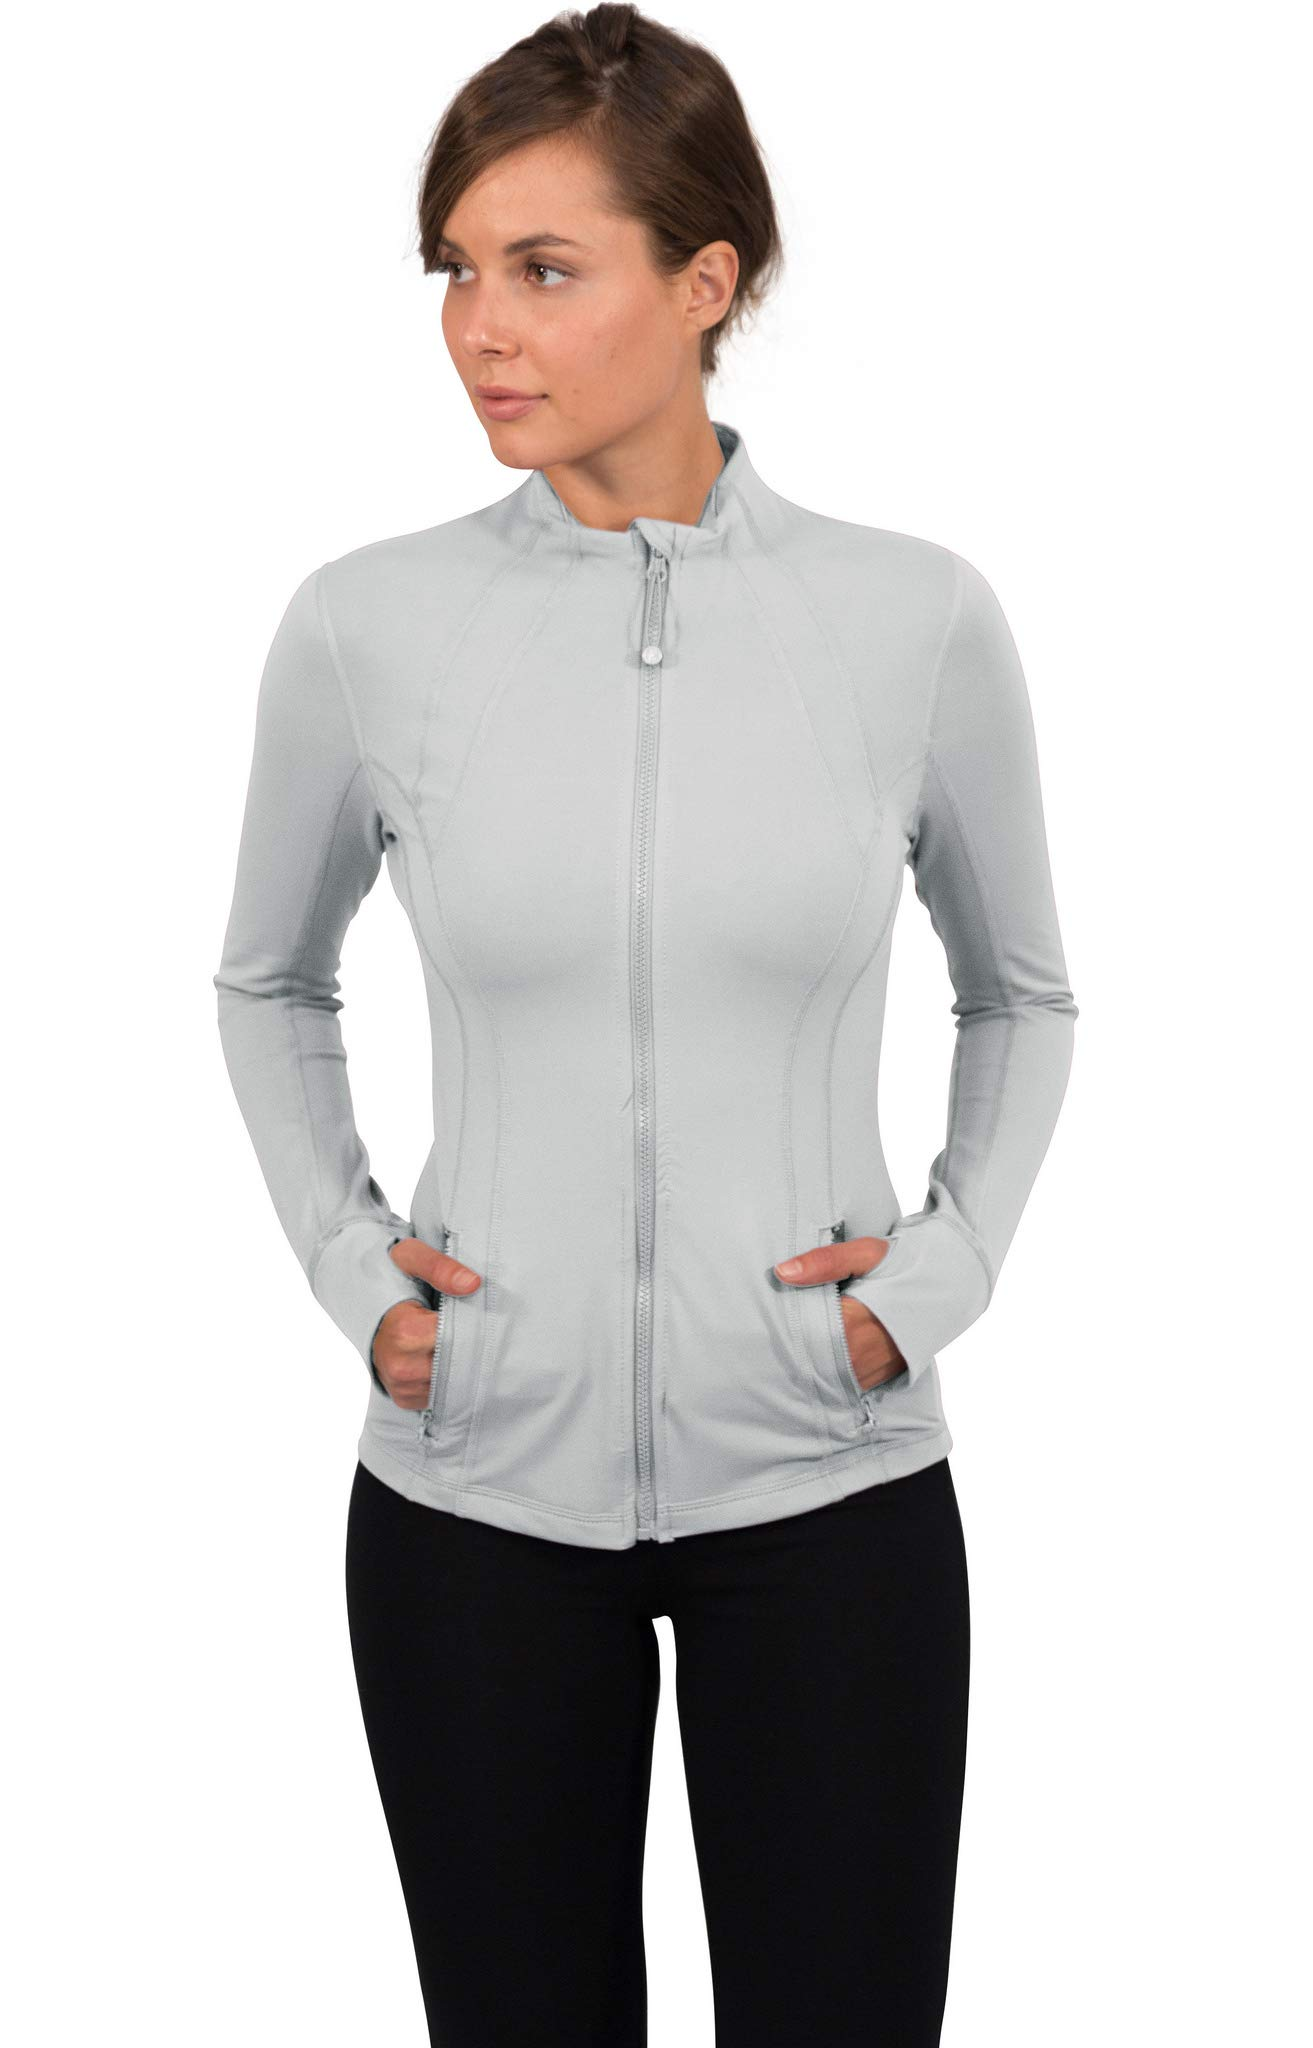 90 Degree By Reflex Women's Lightweight, Full Zip Running Track Jacket - Silver Lilly - XS